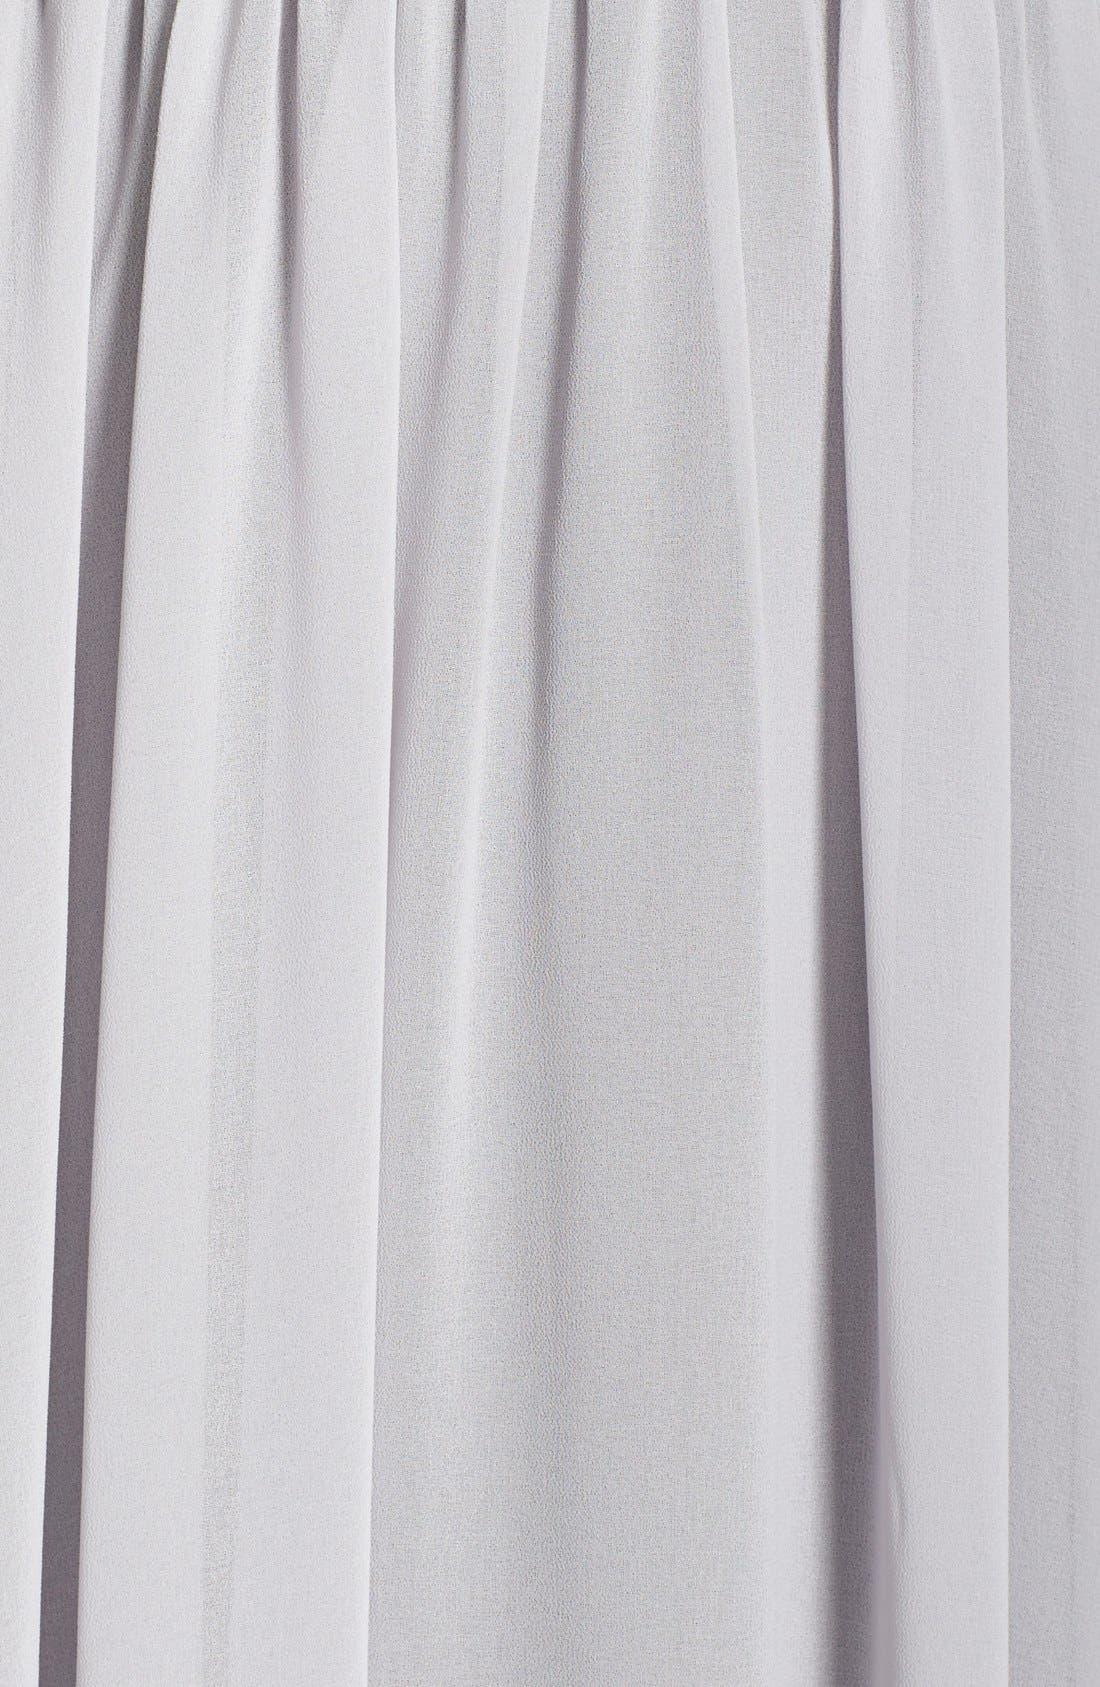 Alternate Image 3  - Paper Crown by Lauren Conrad 'Jillian' Sleeveless Surplice Chiffon Gown